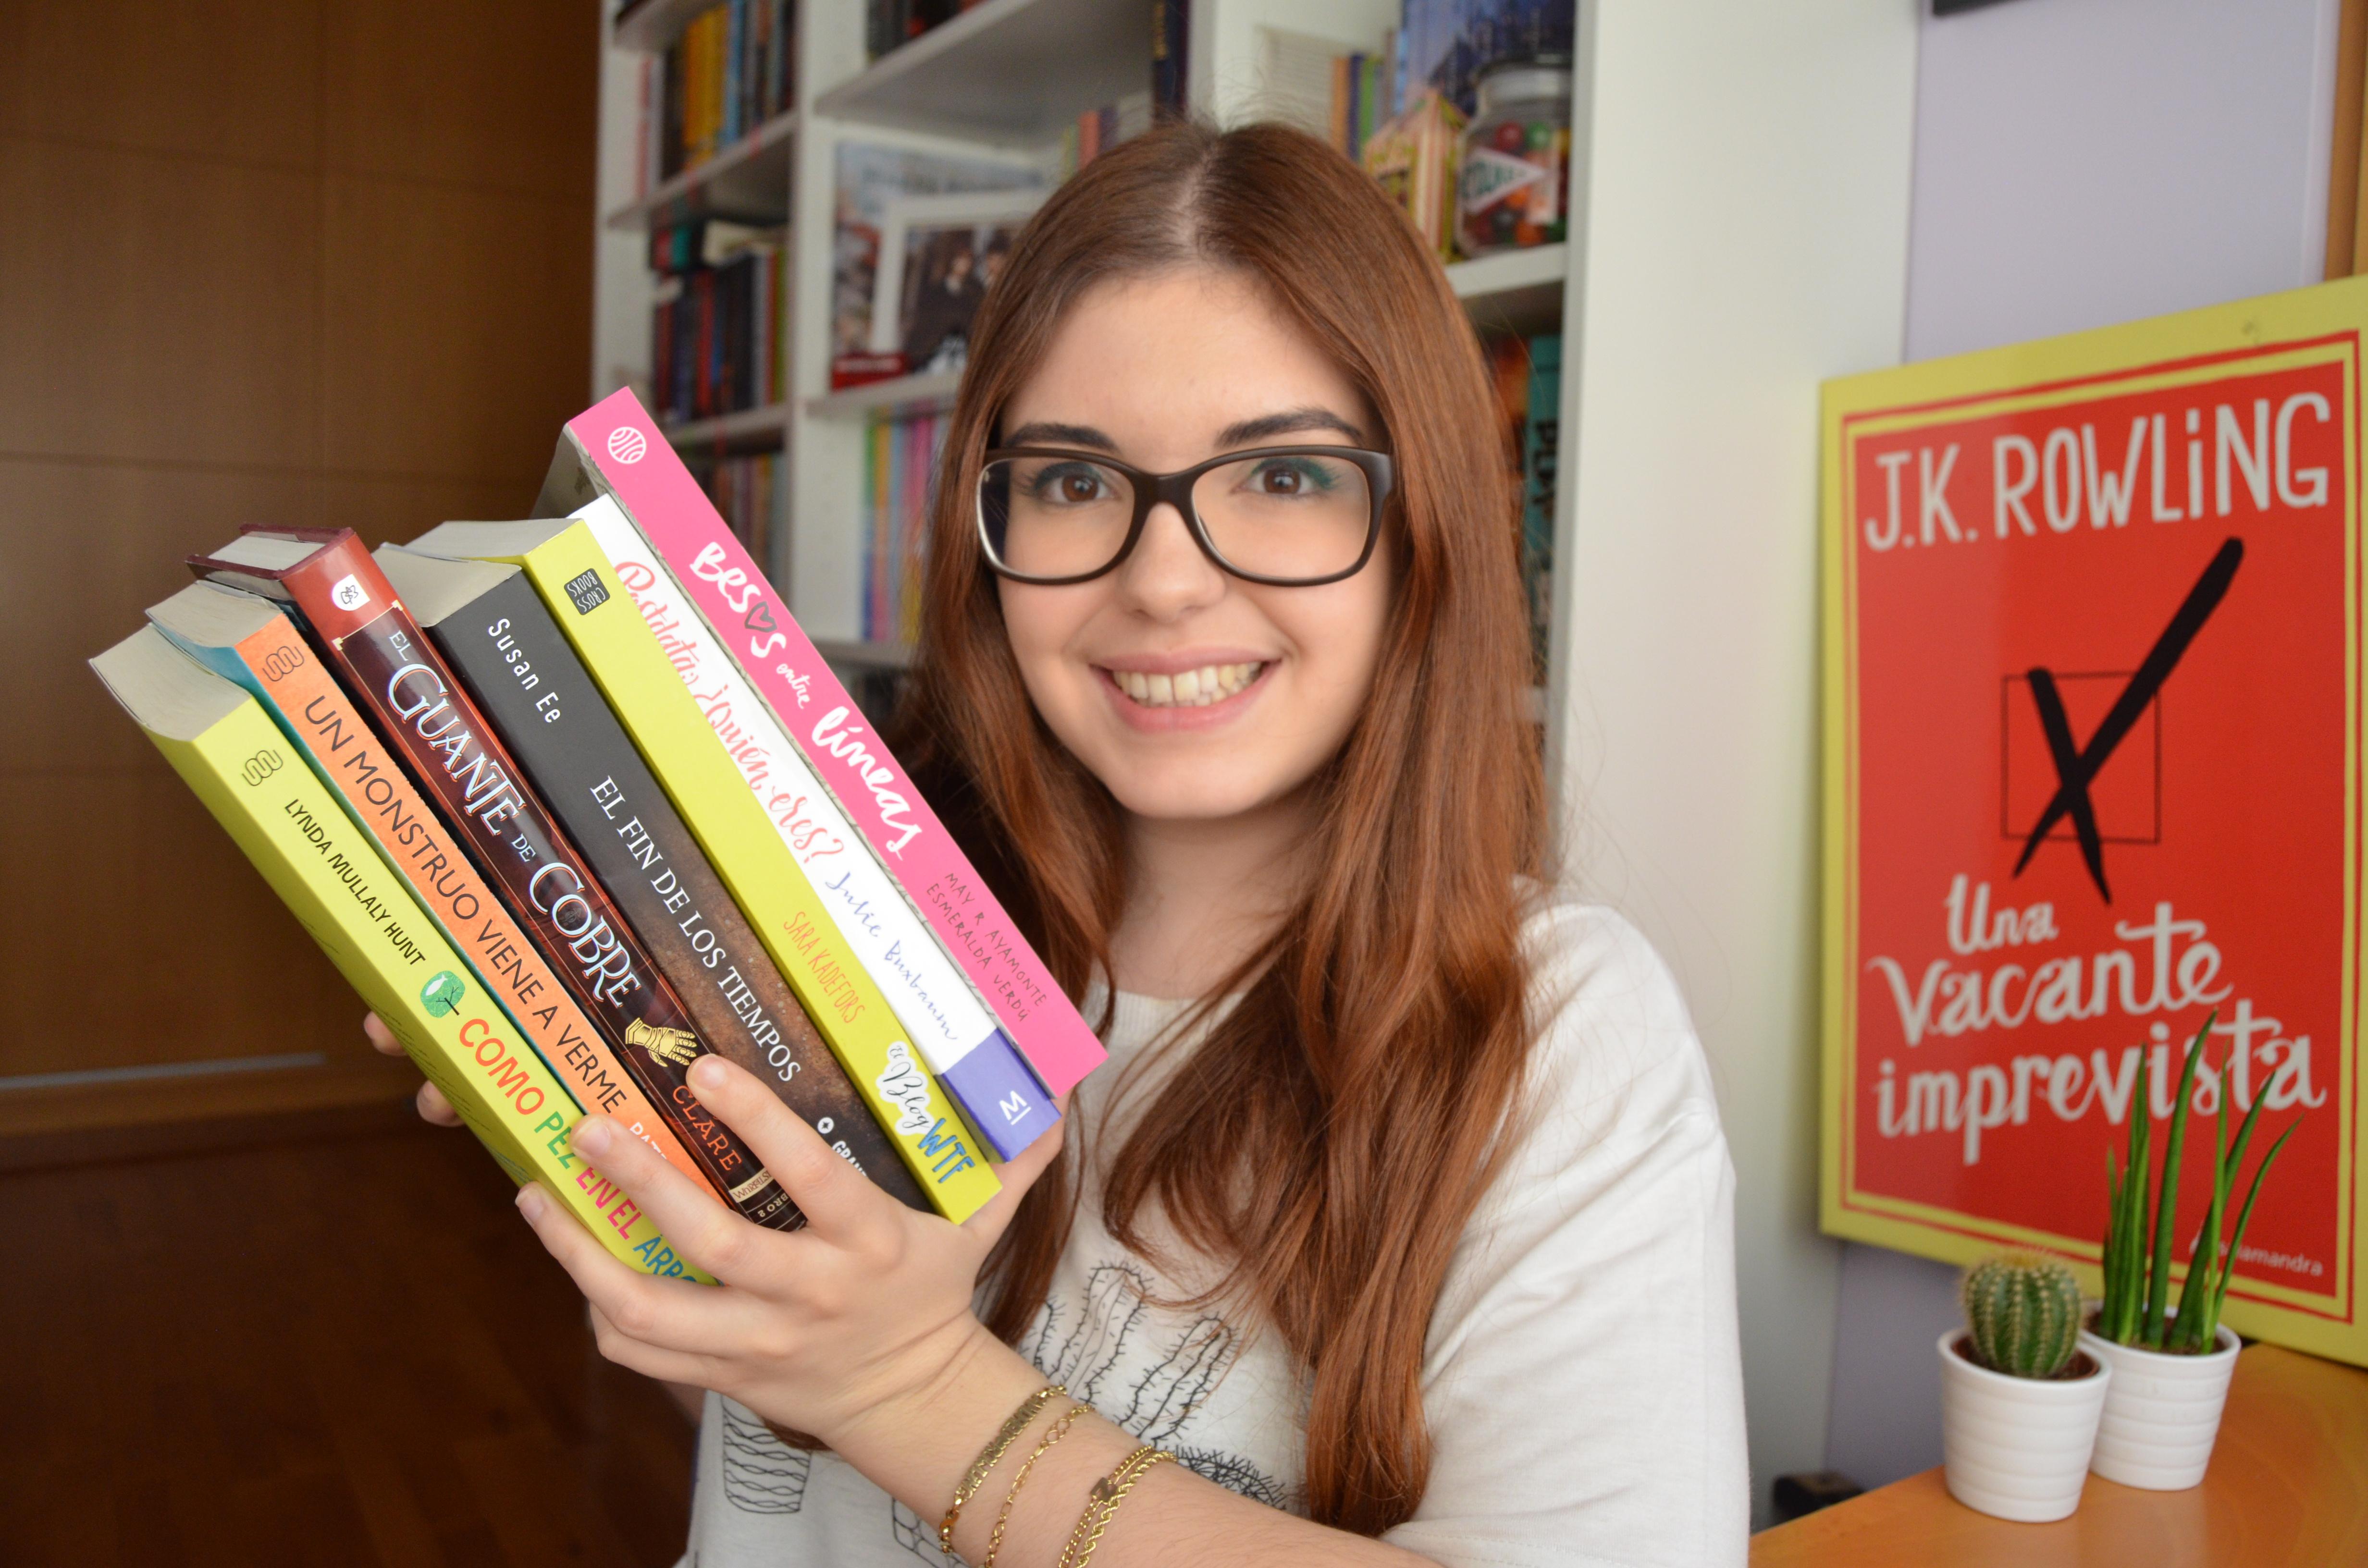 Entrevista a Andreo Rowling, booktuber, escritora y formadora del Campus Booktube de Cubit